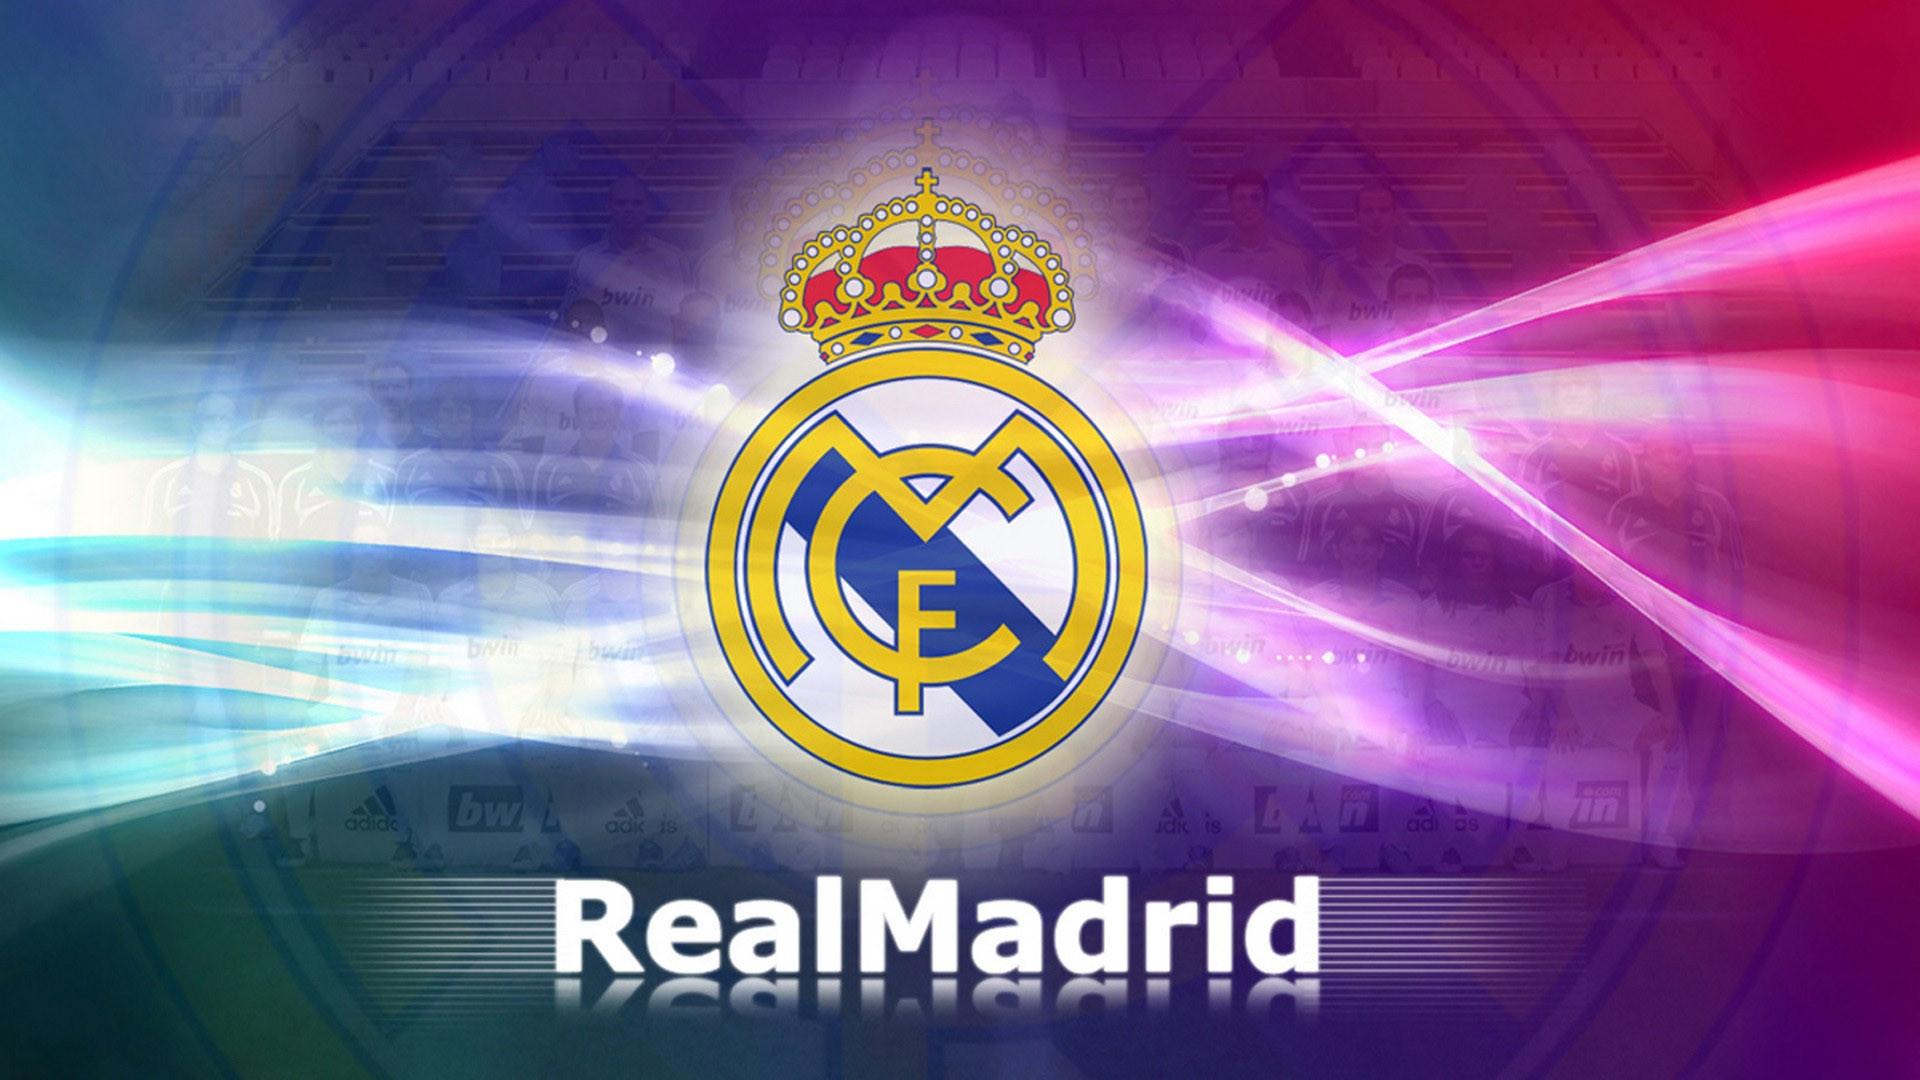 Res: 1920x1080, Real Madrid Football Club Wallpaper Football Wallpaper HD 1920×1200 RealMadrid  Wallpaper (48 Wallpapers